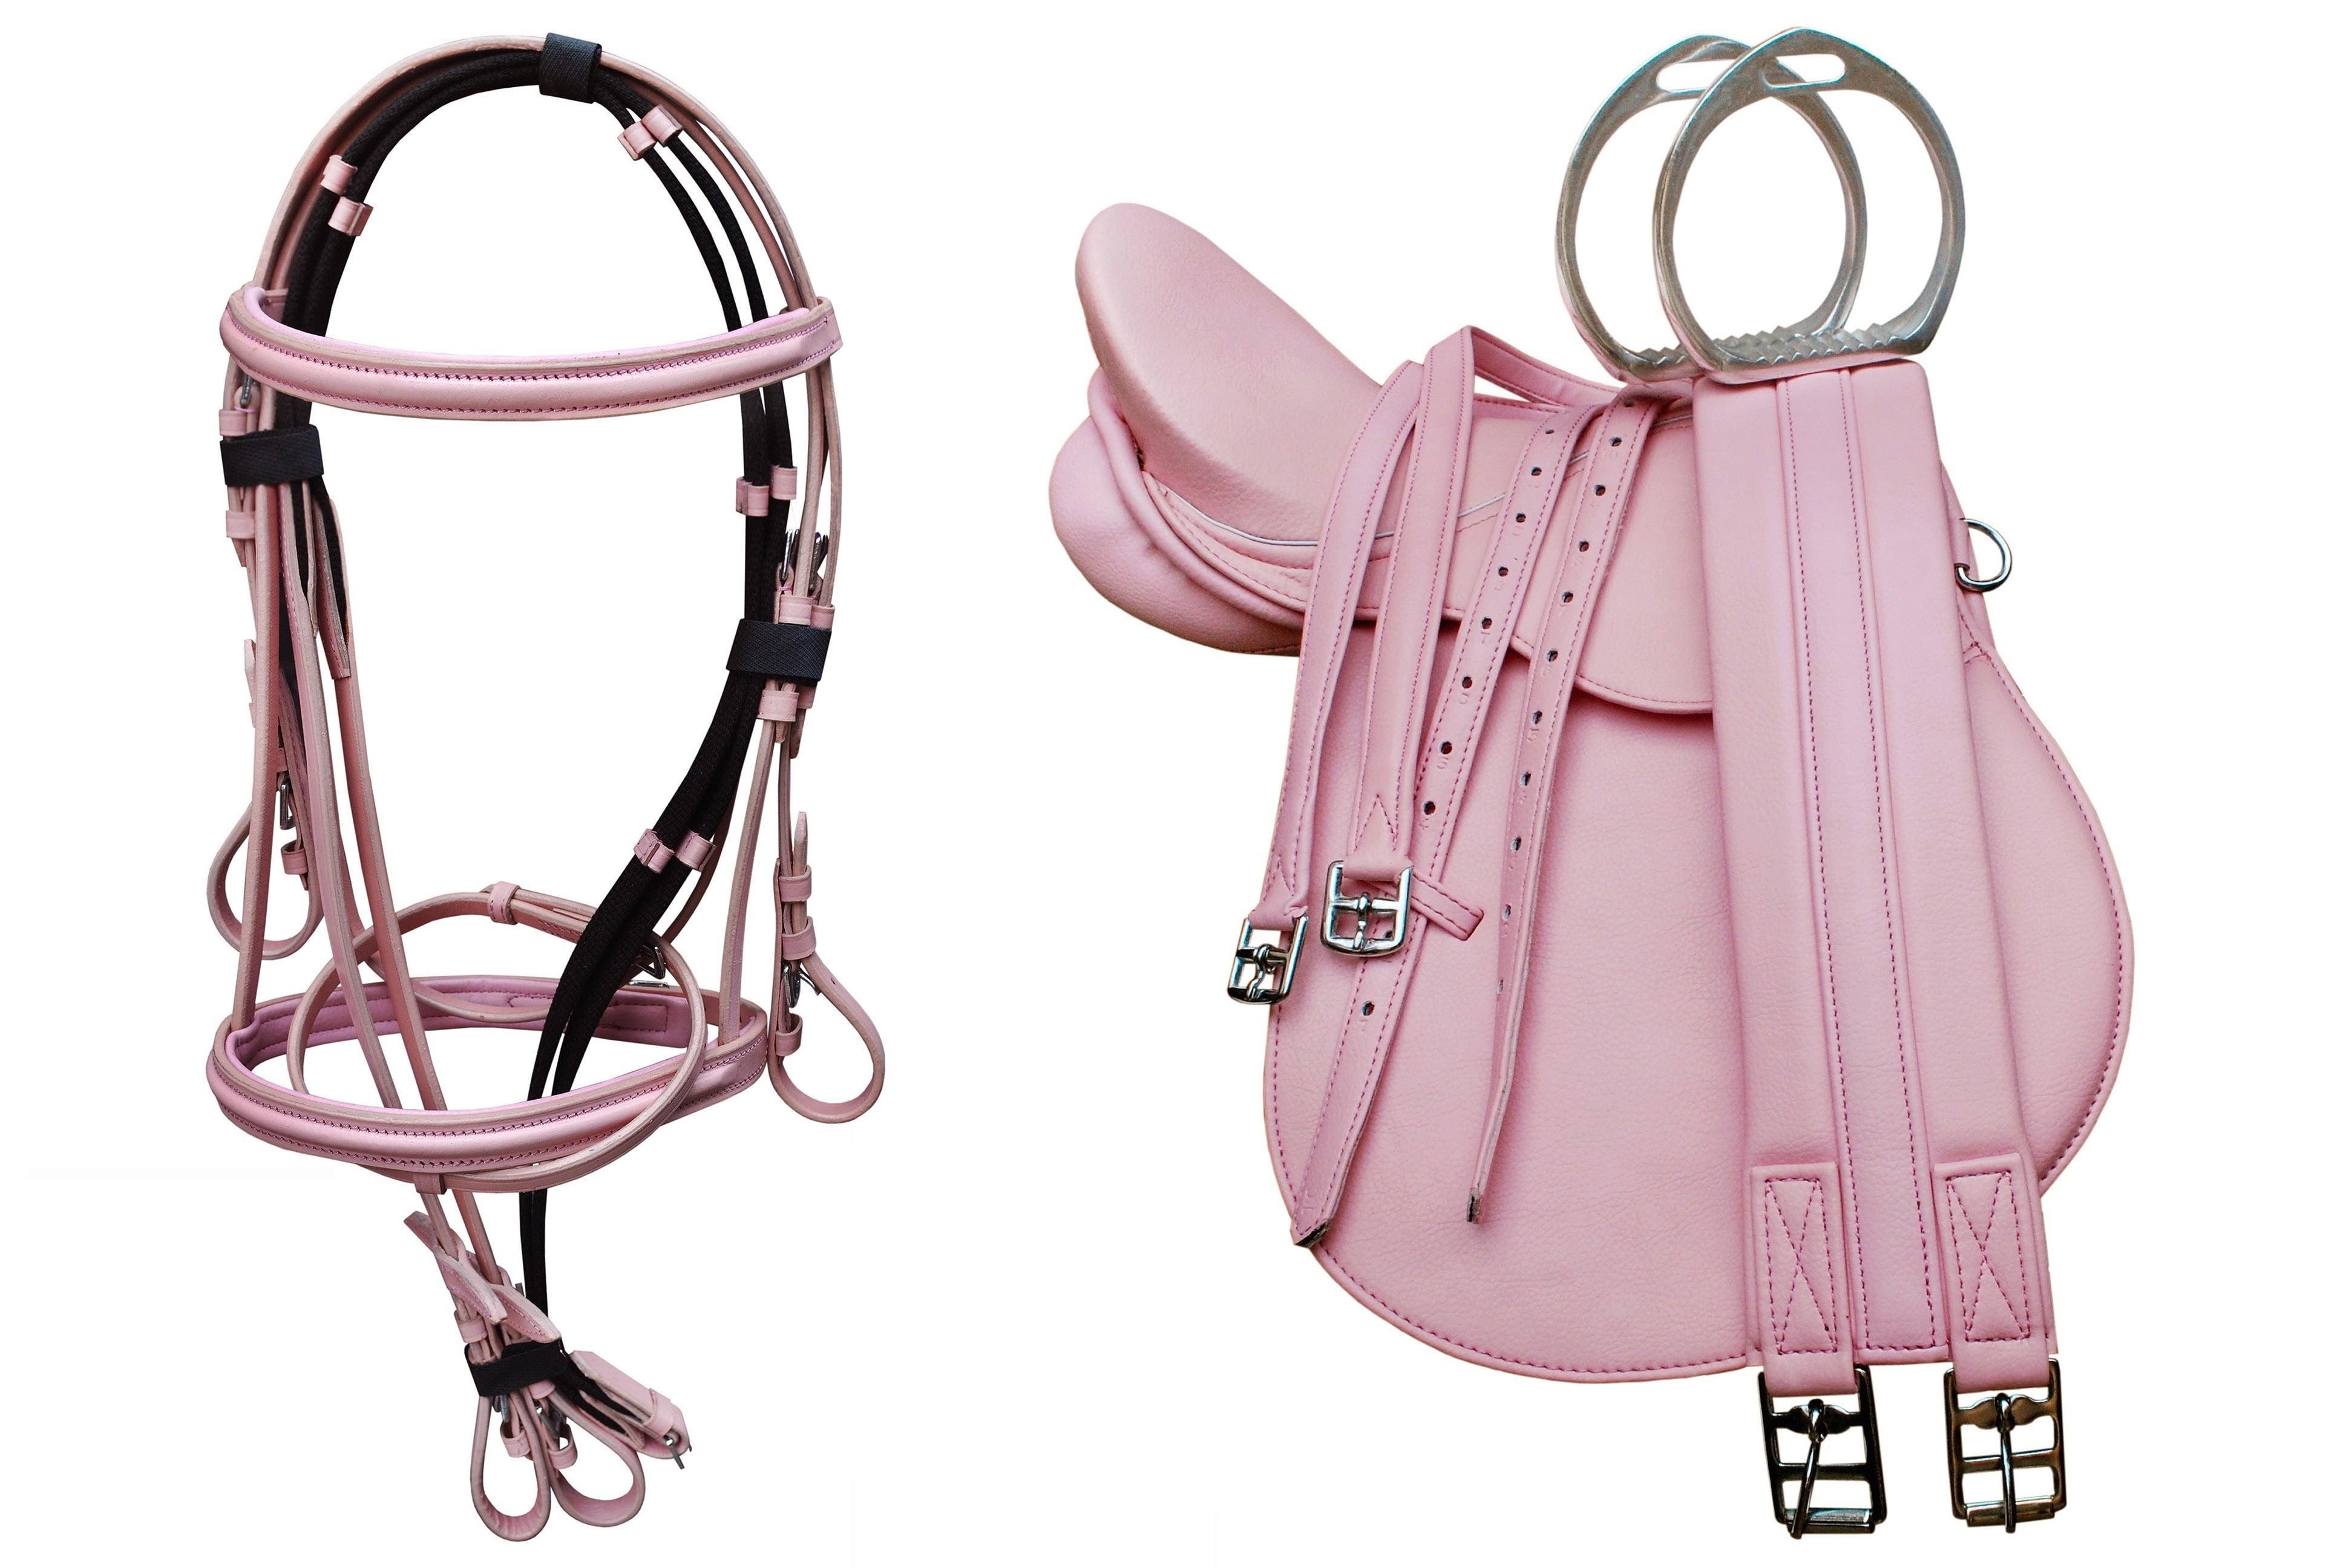 13 Horse Pony Riding Pink English Saddle Set Bridle Girth Stirrups 804azes1033 Walmart Com Walmart Com